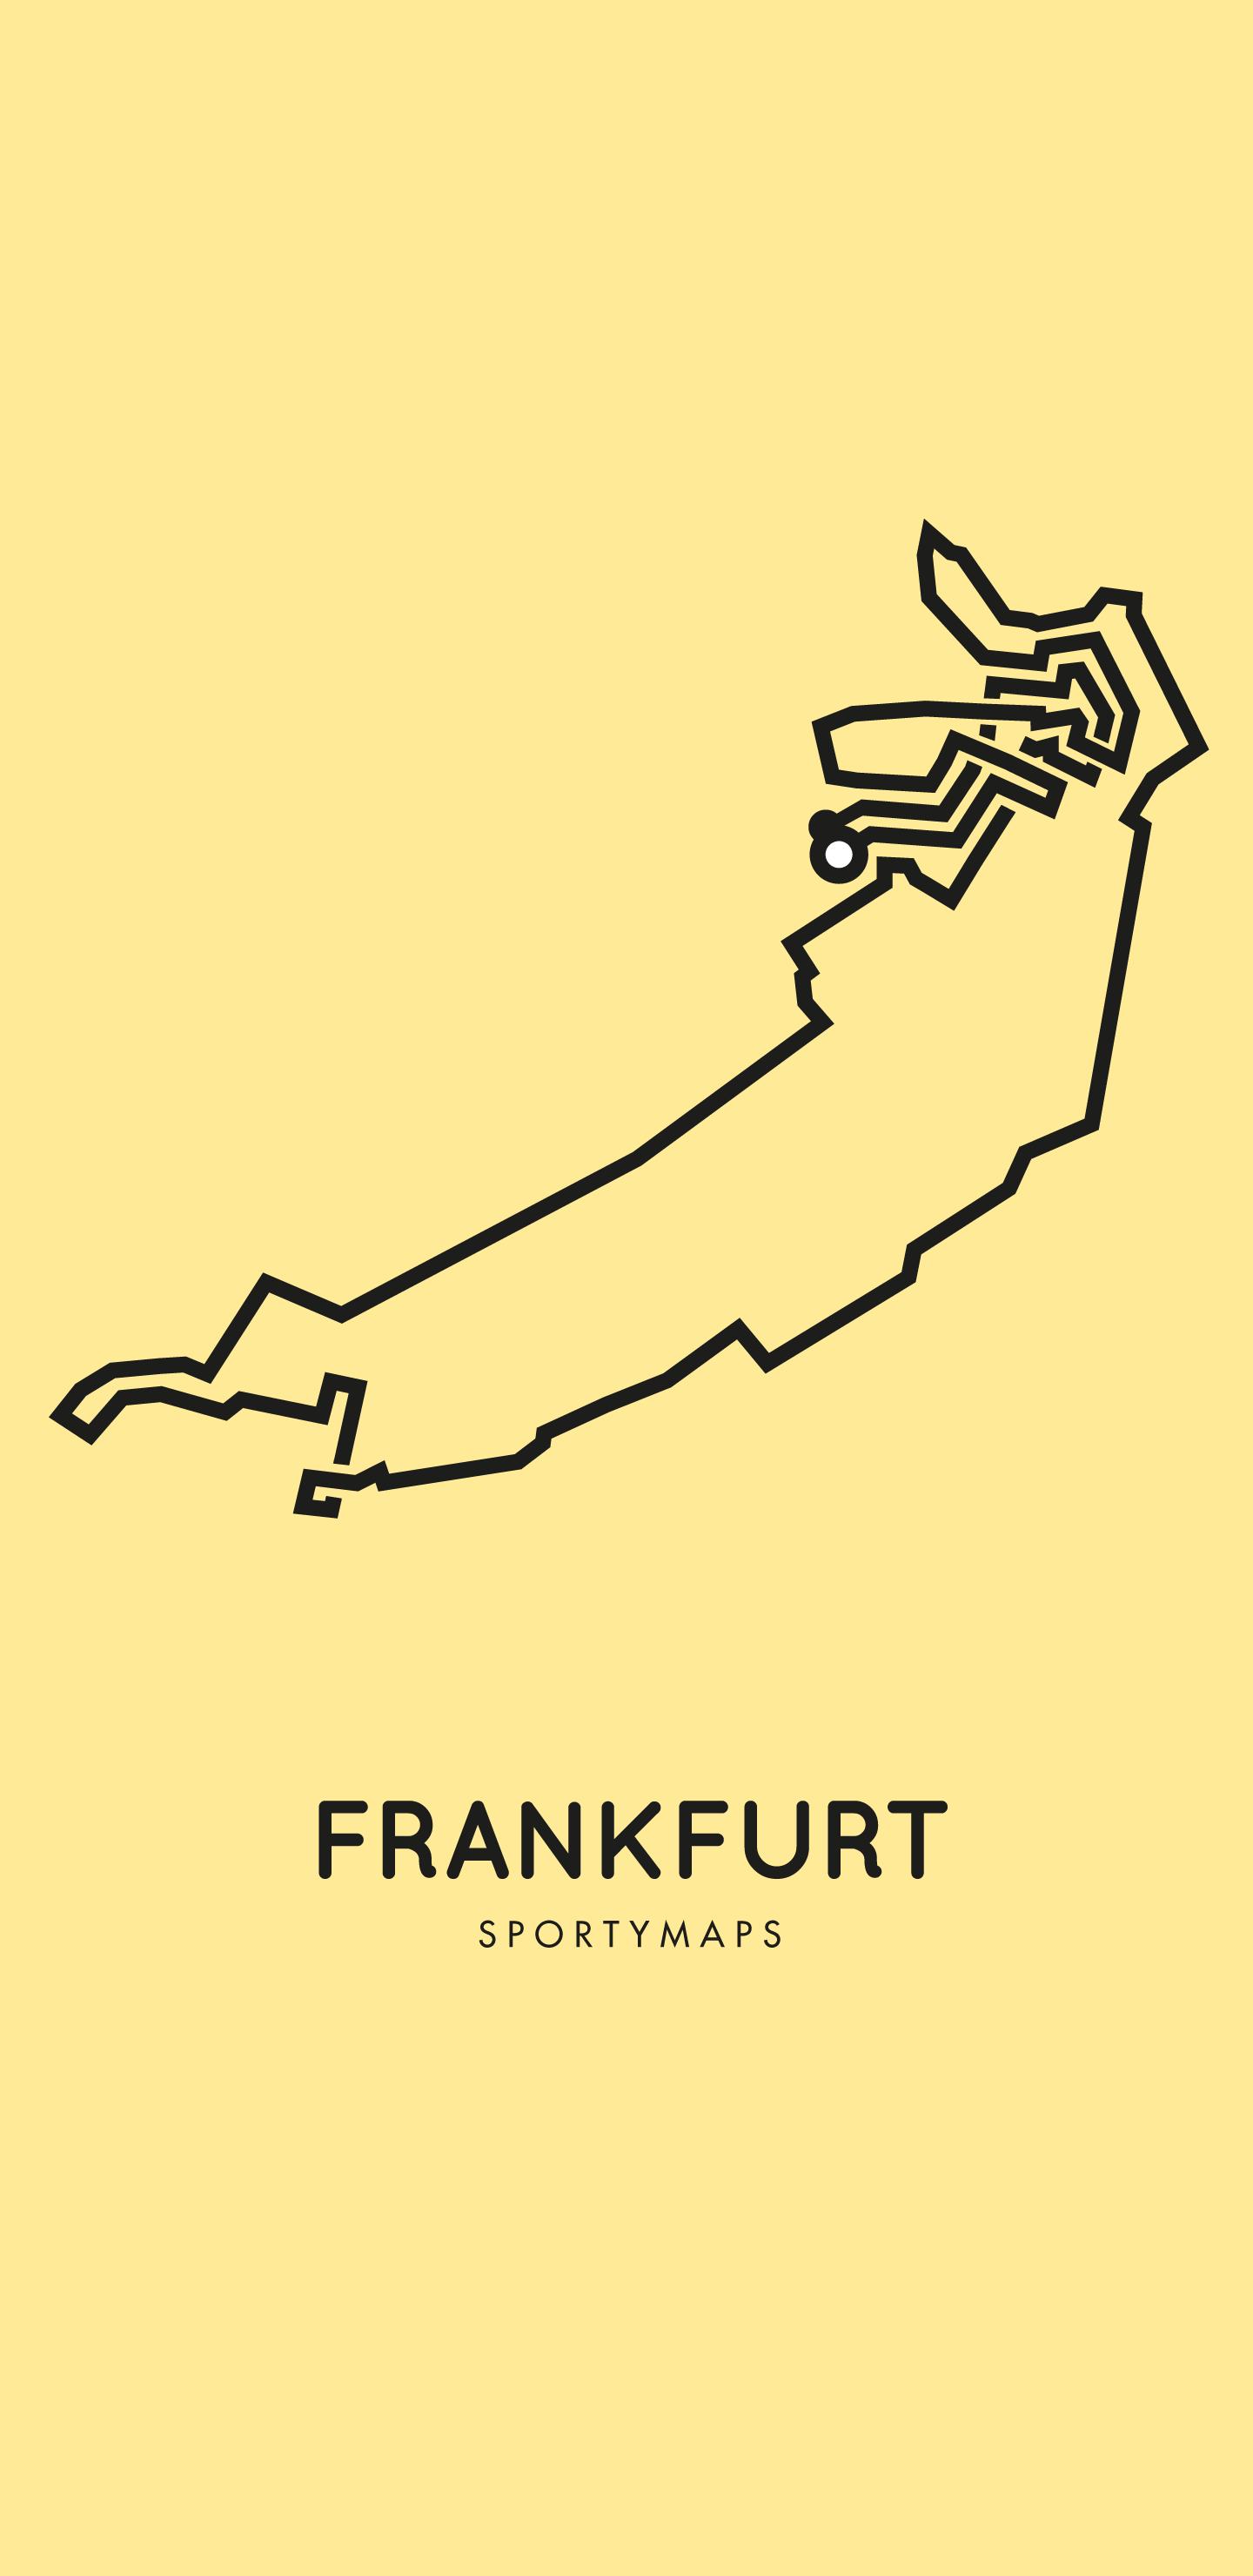 Sportymaps-Frankfurt-marathon-yellow